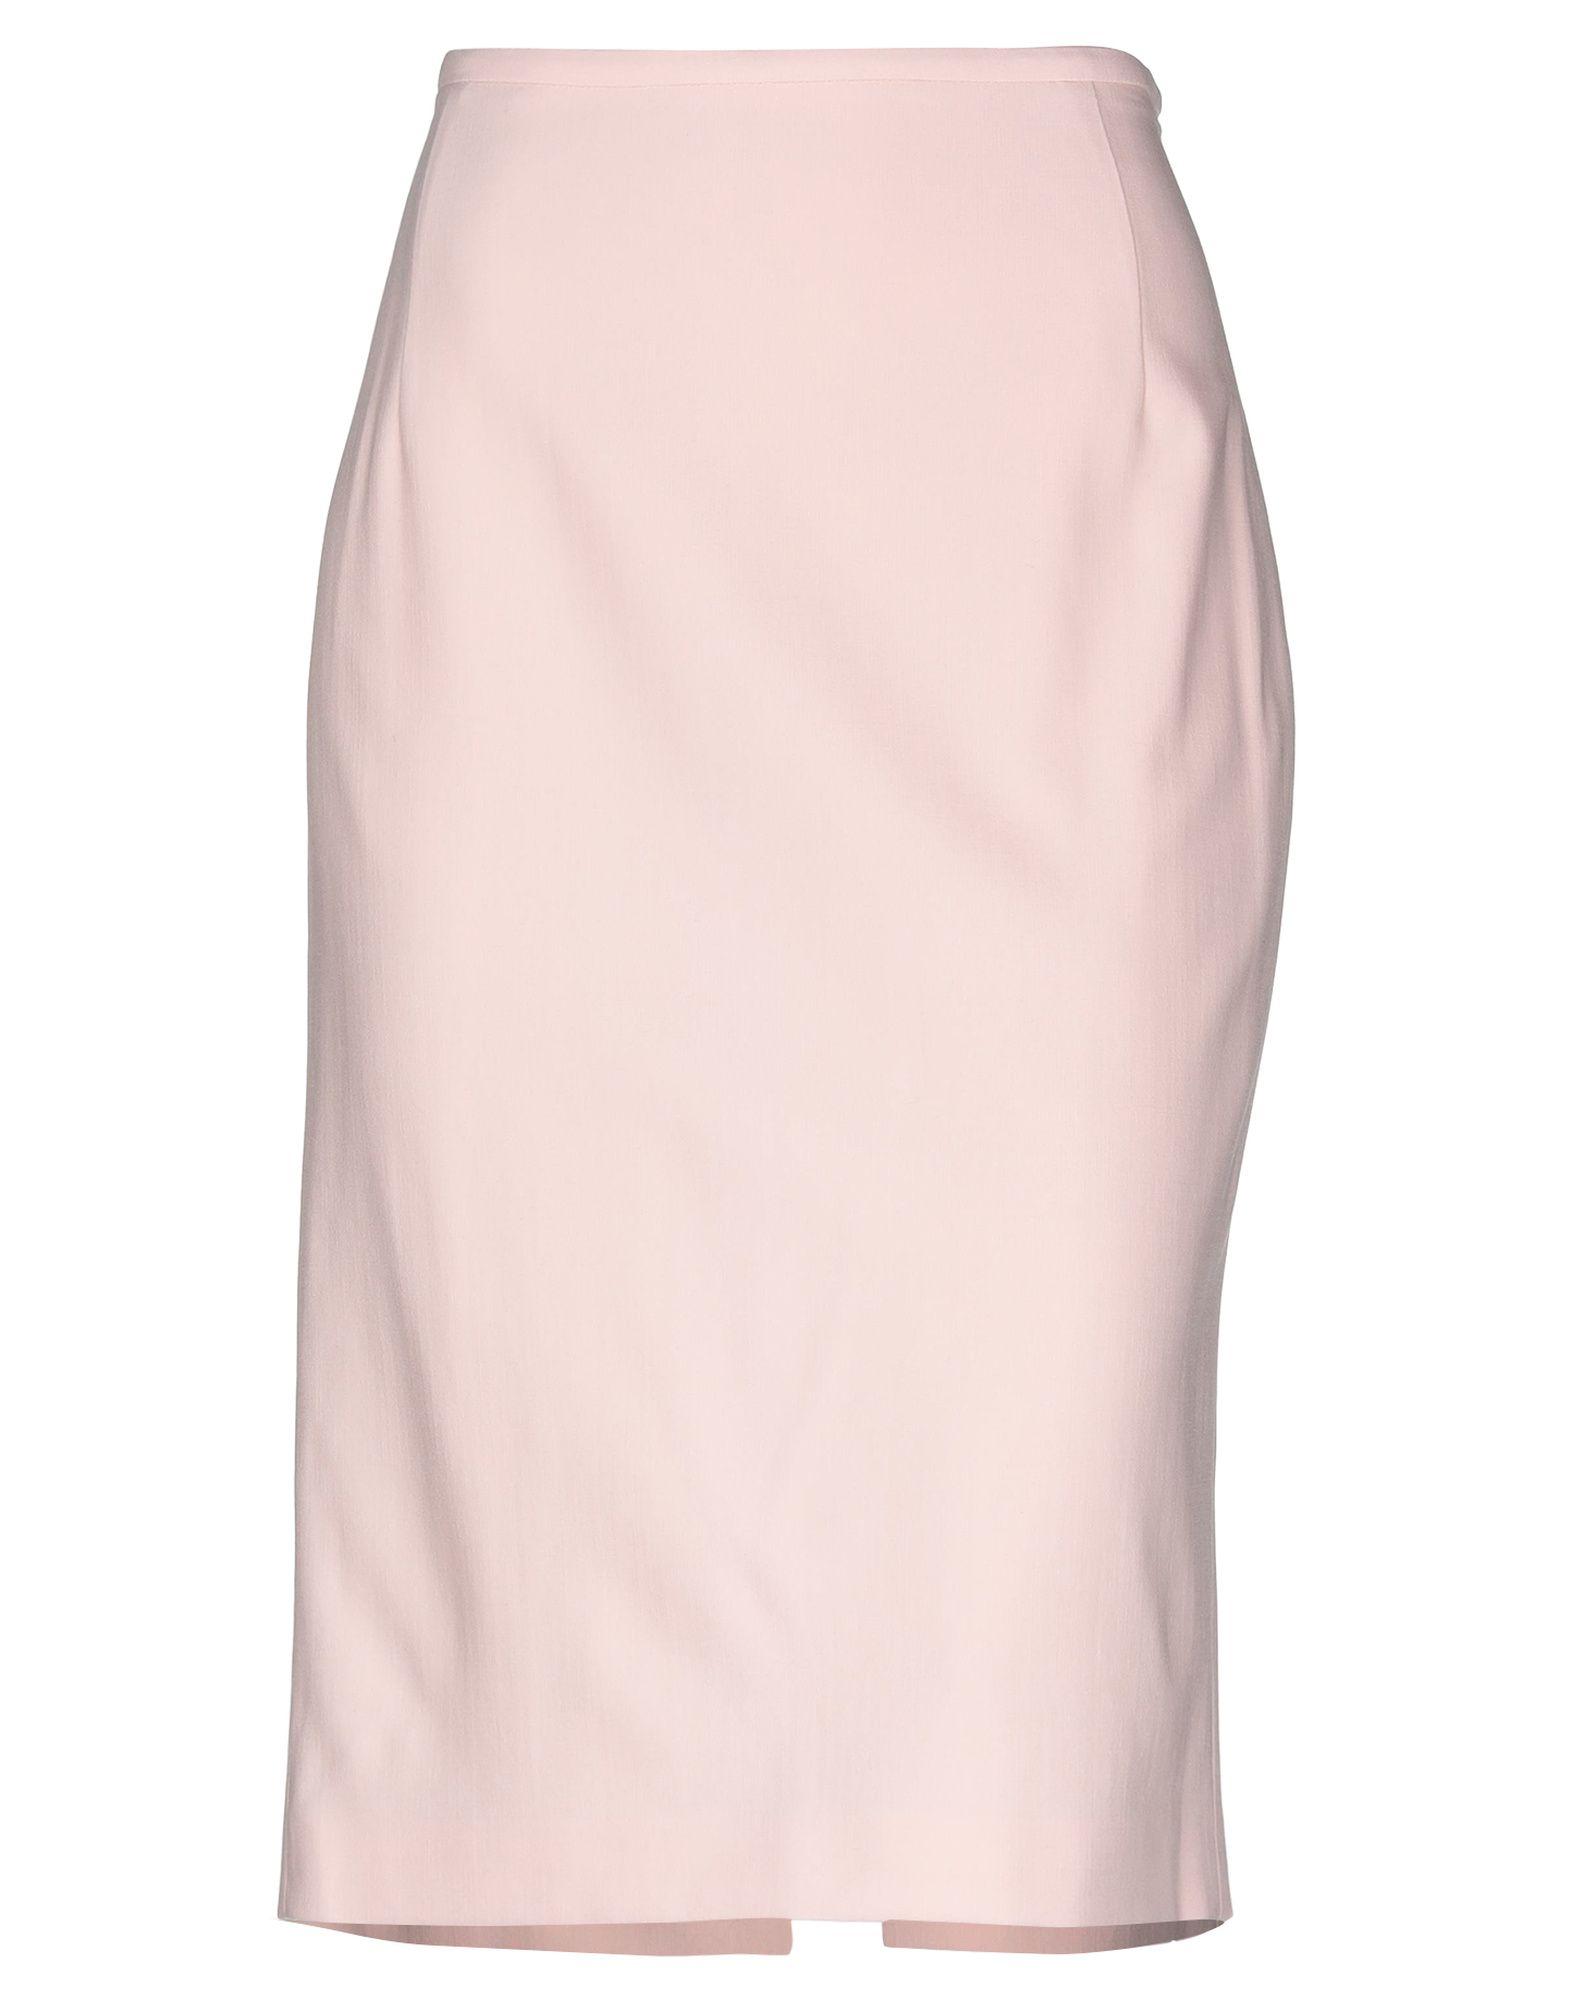 MICHAEL KORS COLLECTION Юбка длиной 3/4 sh collection юбка длиной 3 4